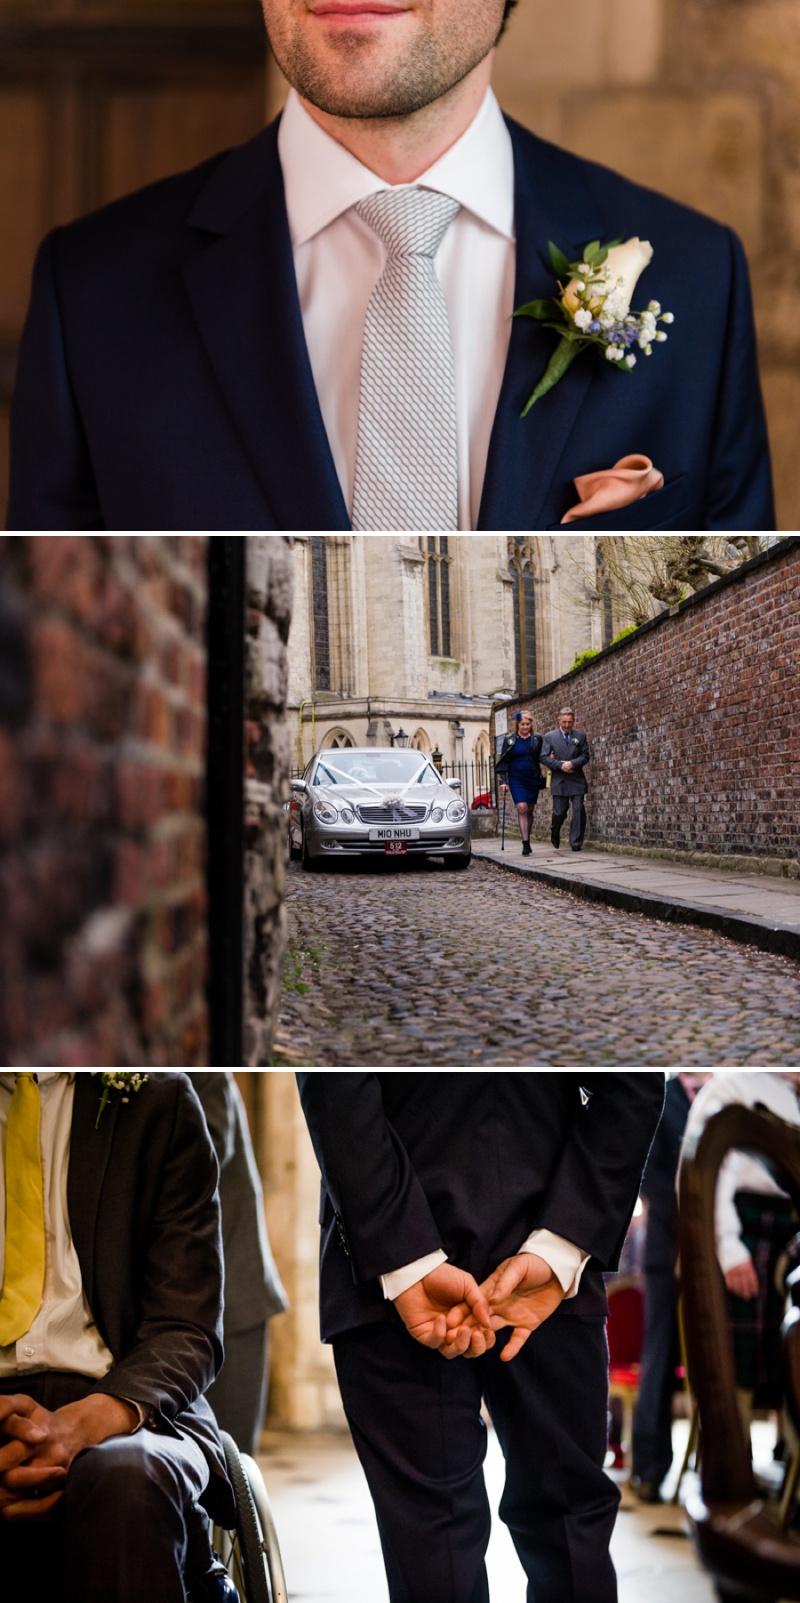 Blue Reiss Mens Suit Groom Shoot Wedding Photography